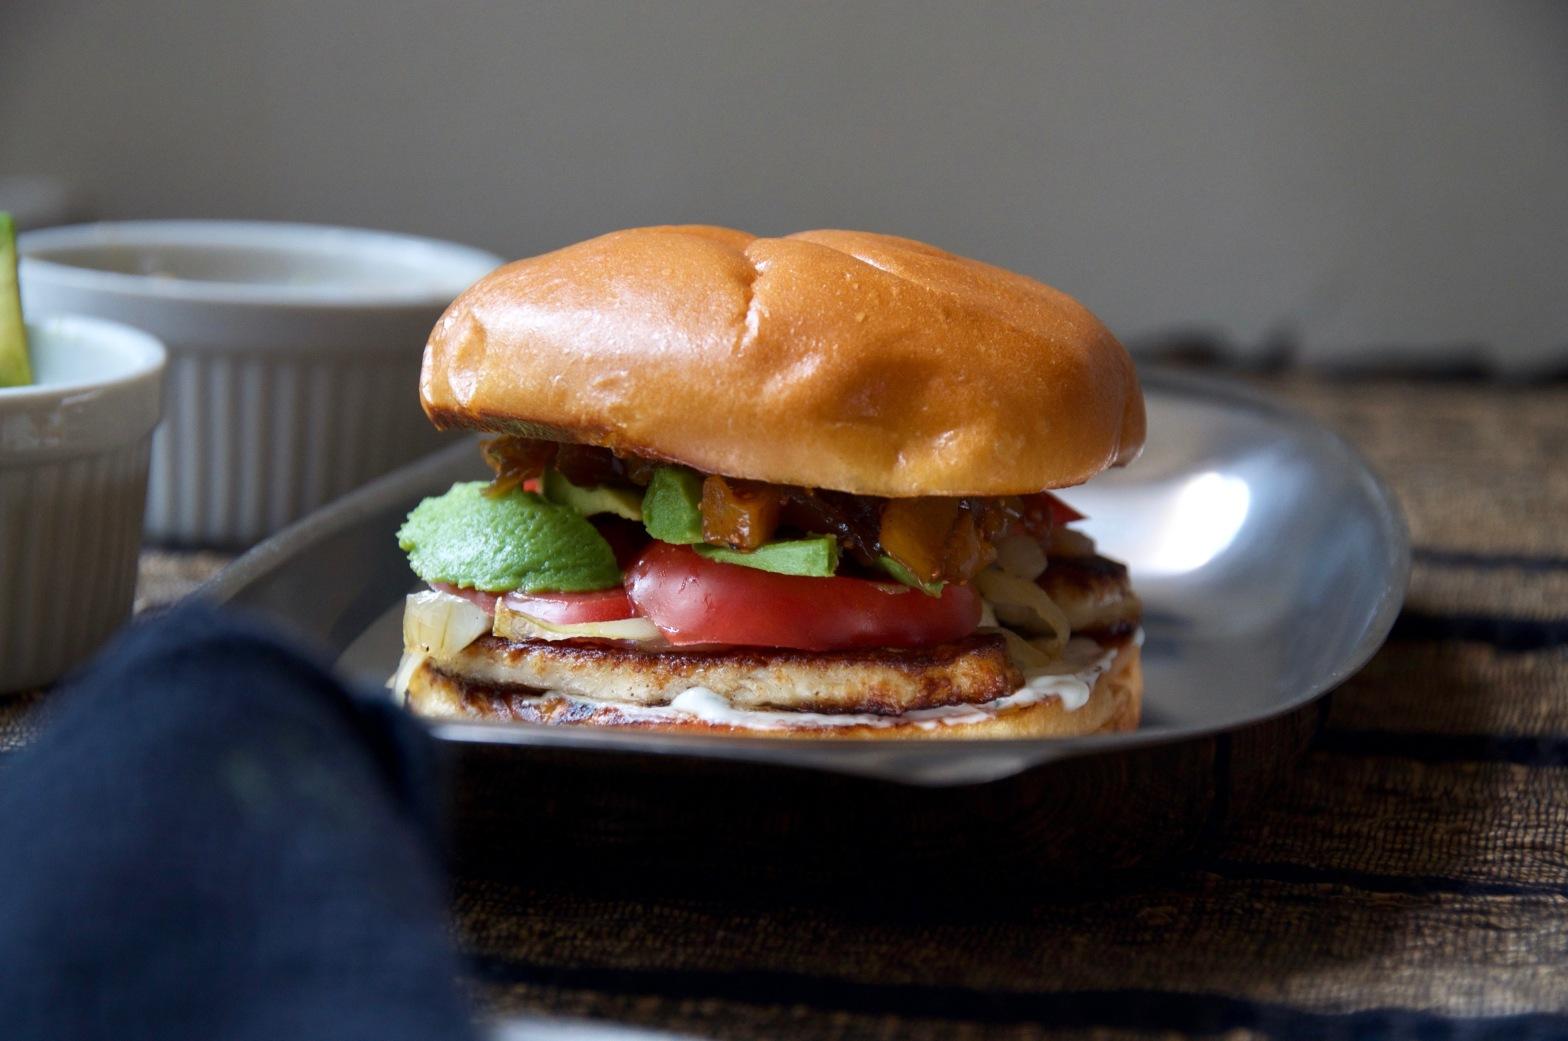 halloumi burgers – also honey